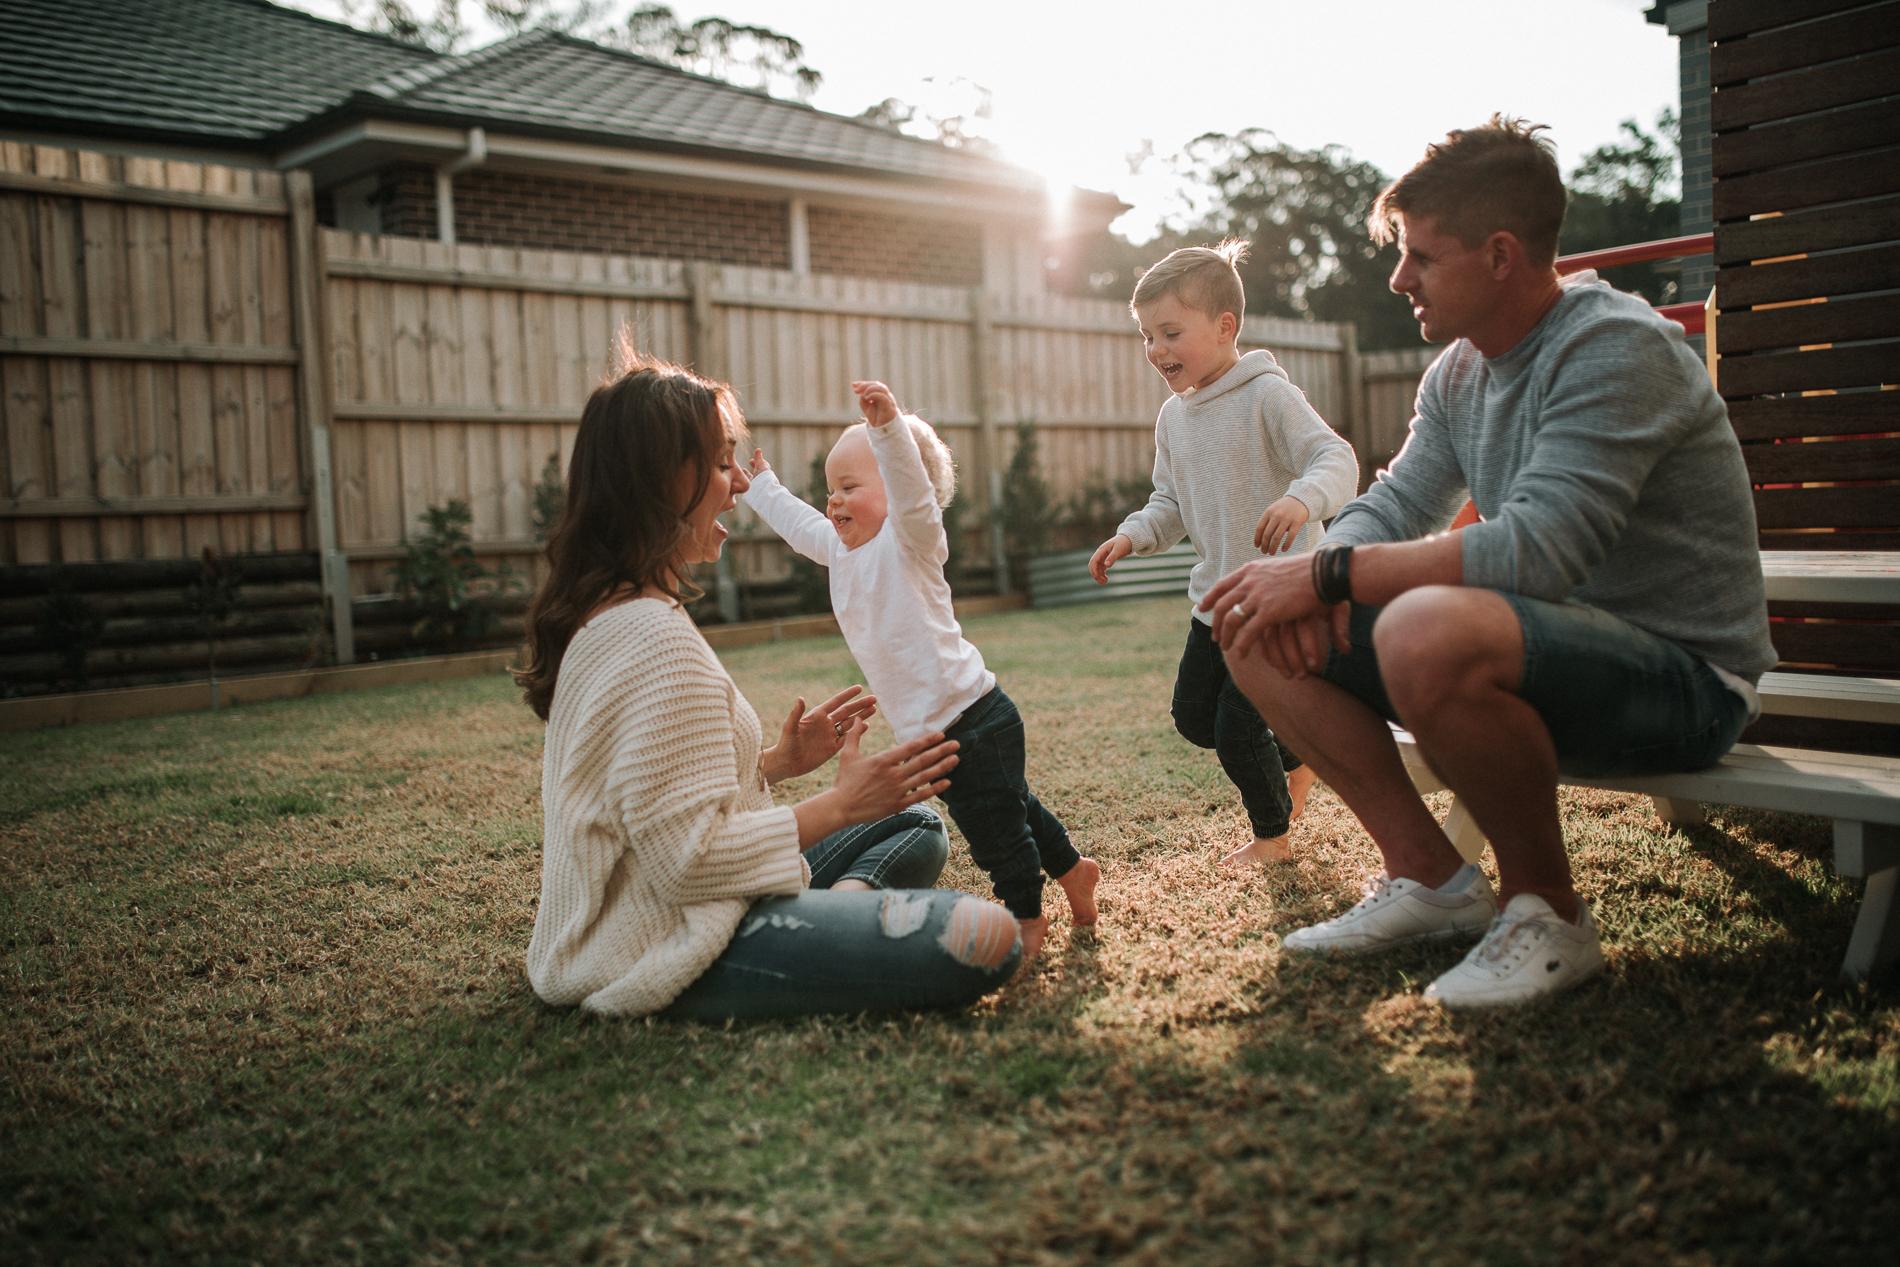 20180728_Sydney_Family_Photographer_ 3139.jpg